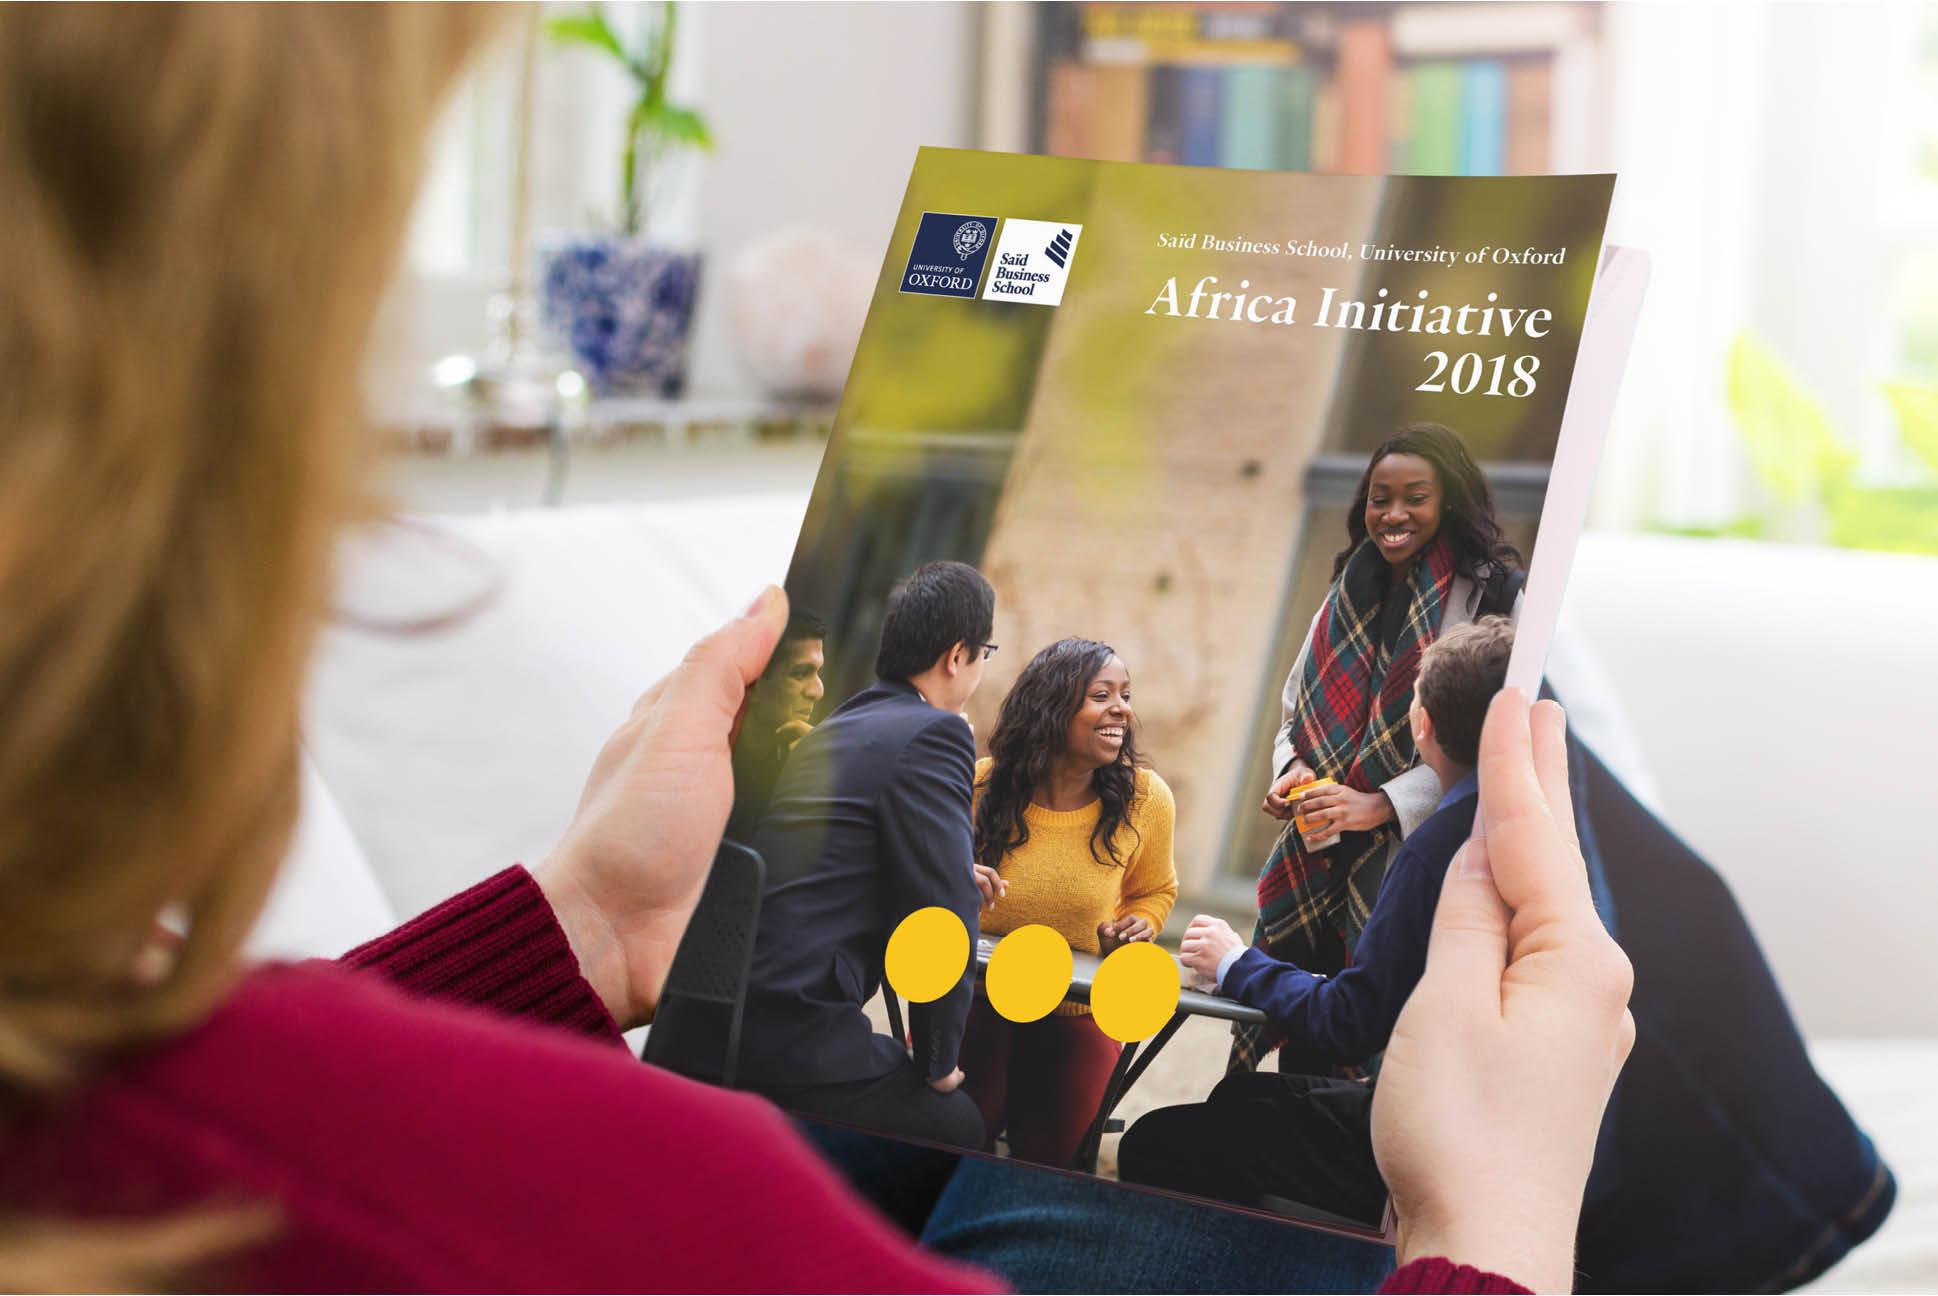 Saïd Business School Africa Initiative brochure | IM London - Independent Marketing | Education Branding London